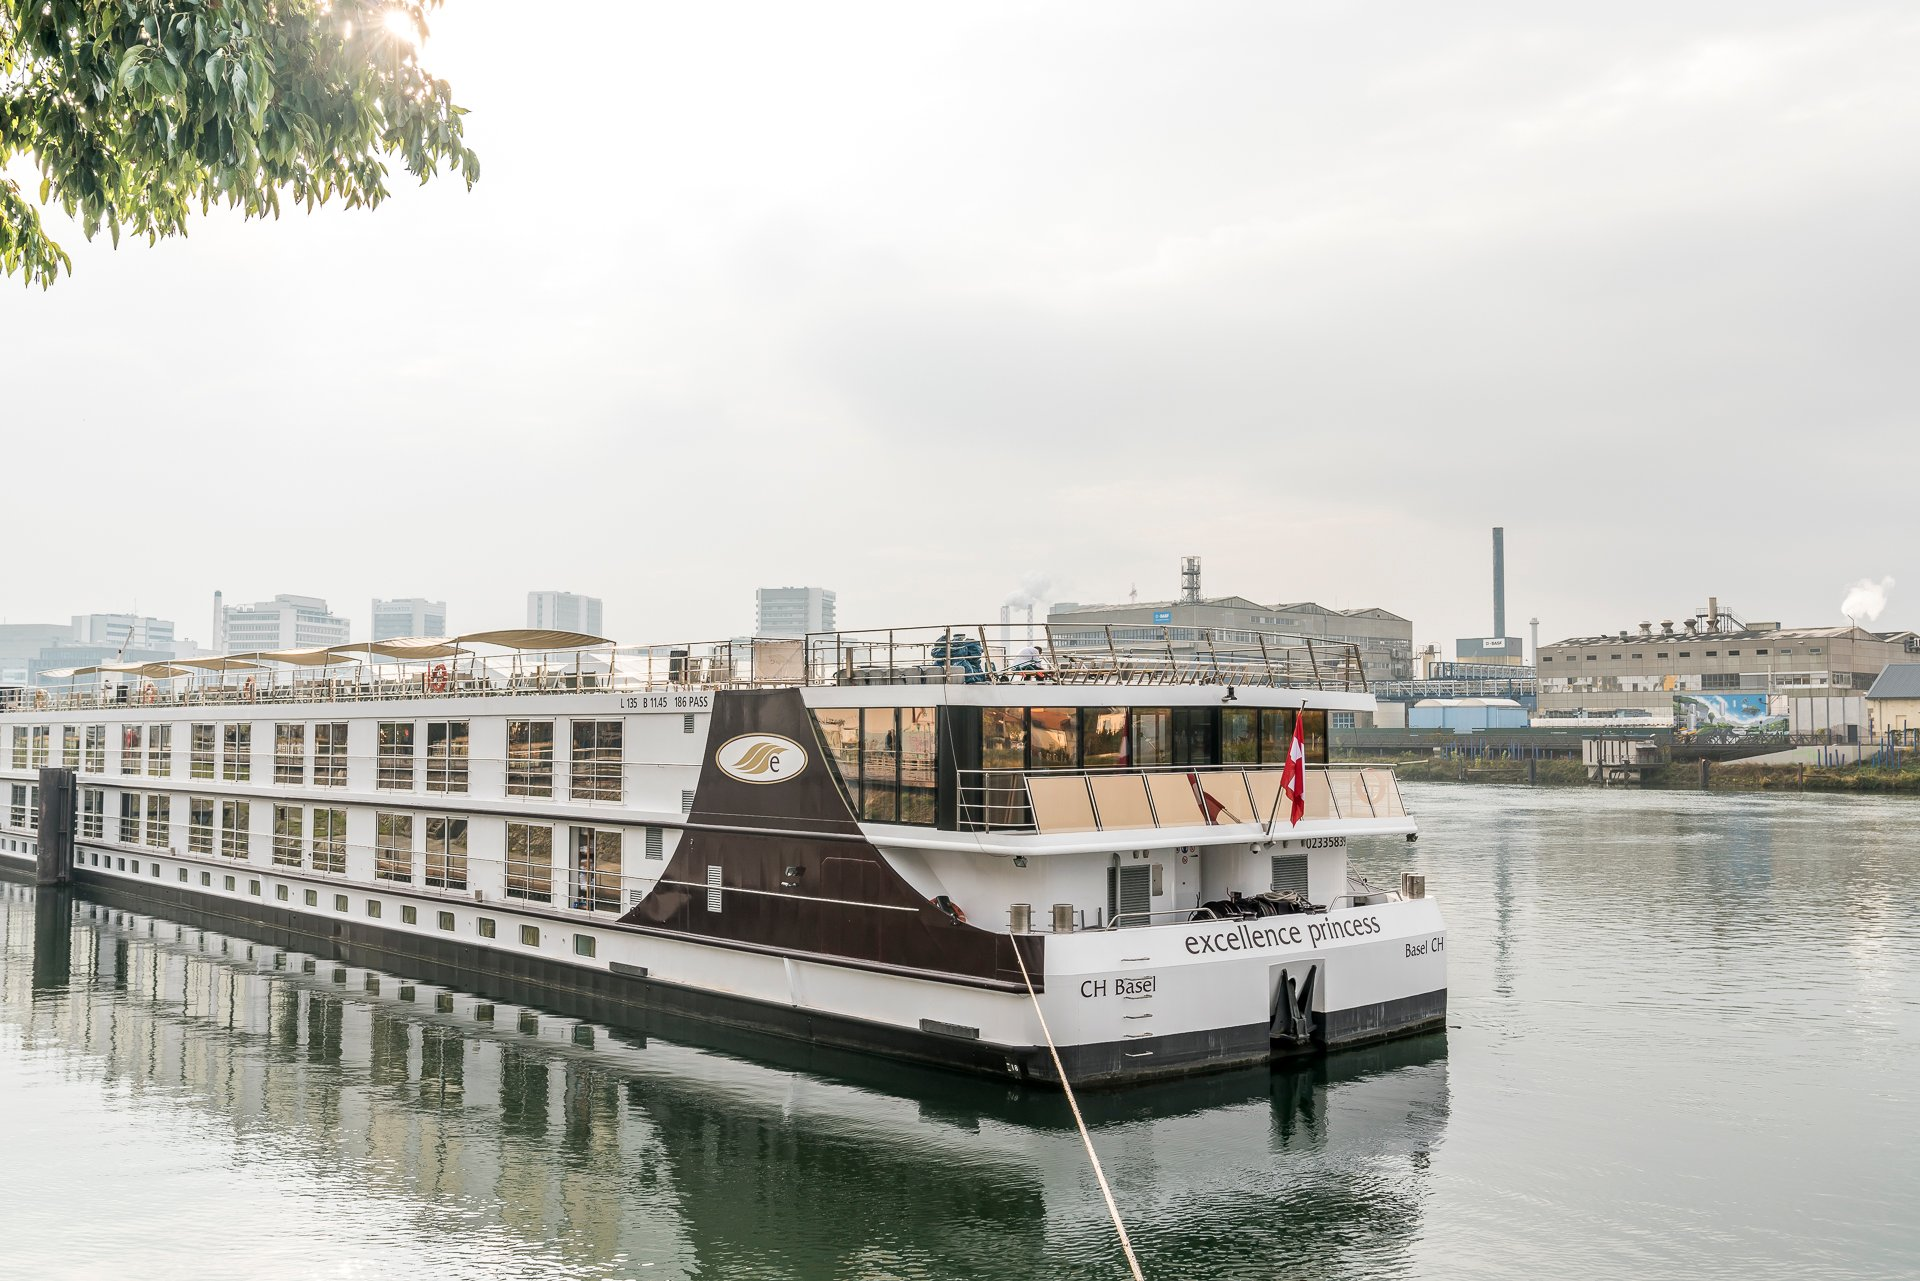 Excellence Princess Flusskreuzfahrt